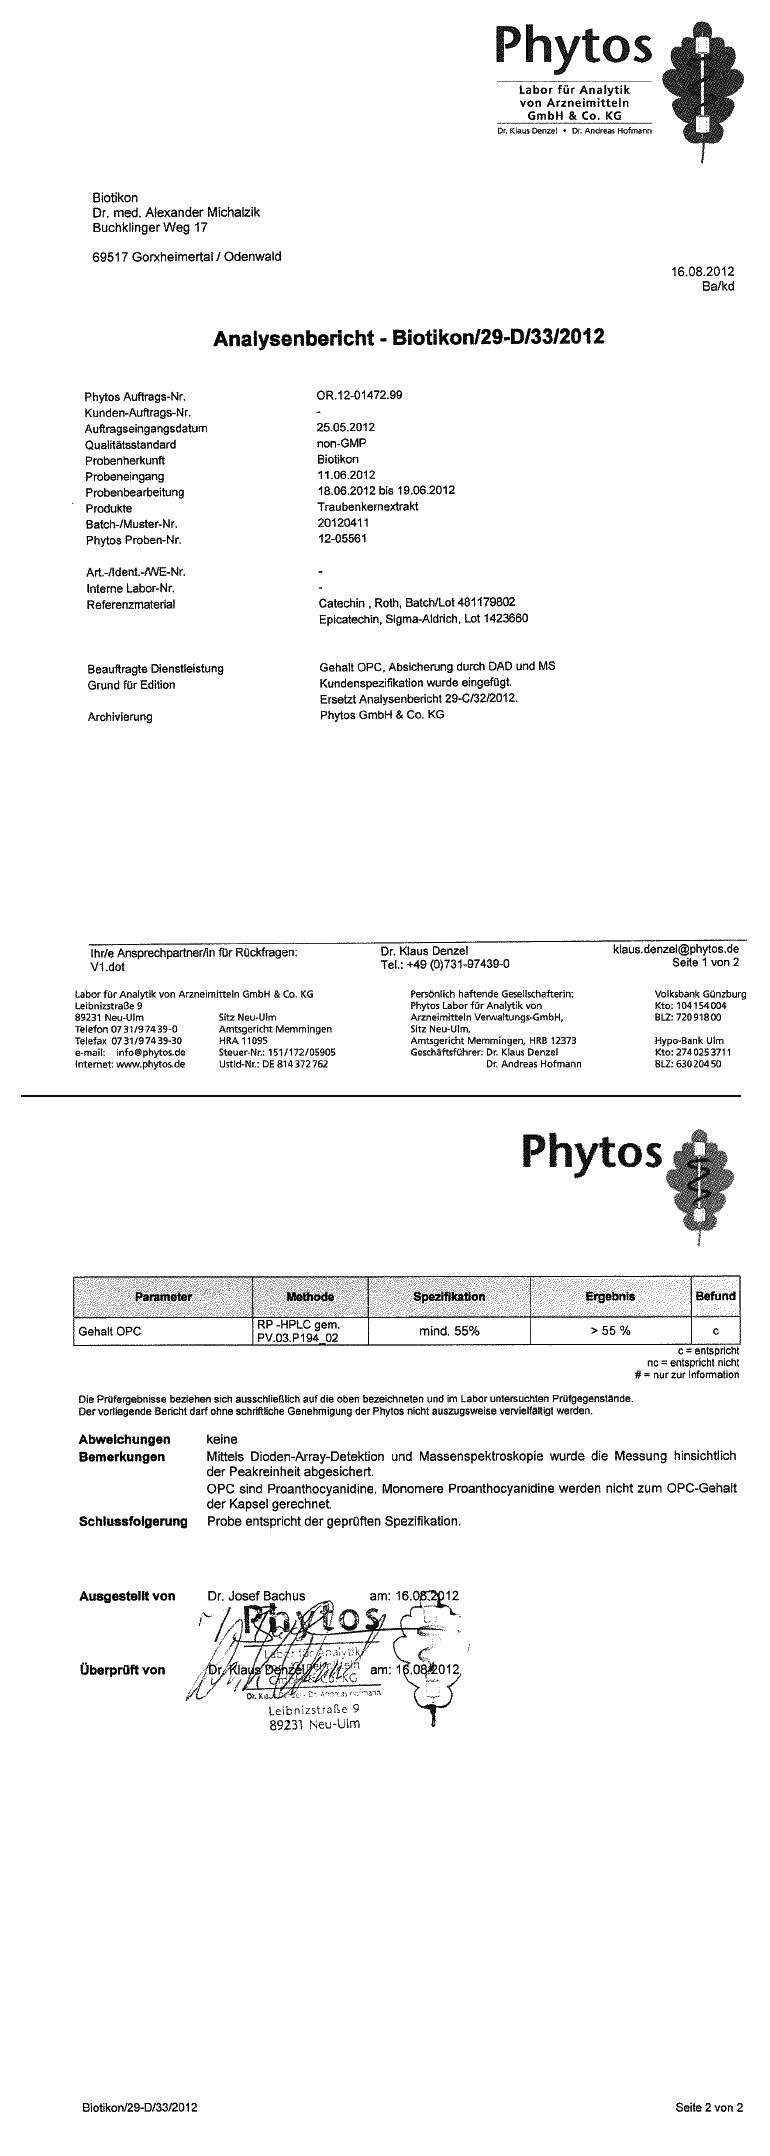 hplc_opc_piperin-pro(1).jpg